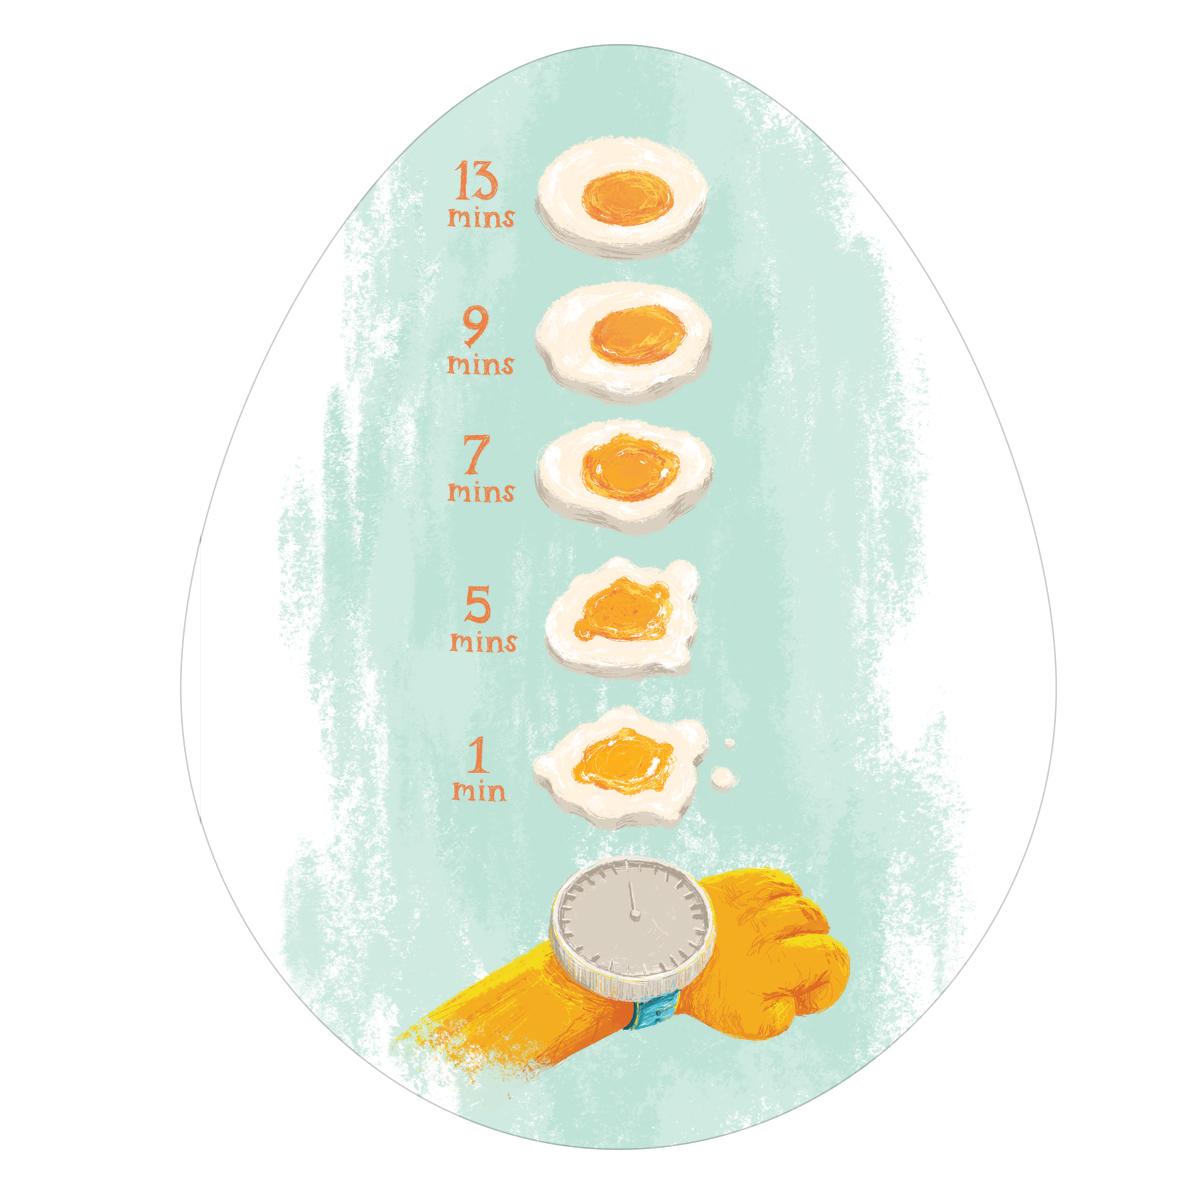 Eggfographic_forweb5.jpg